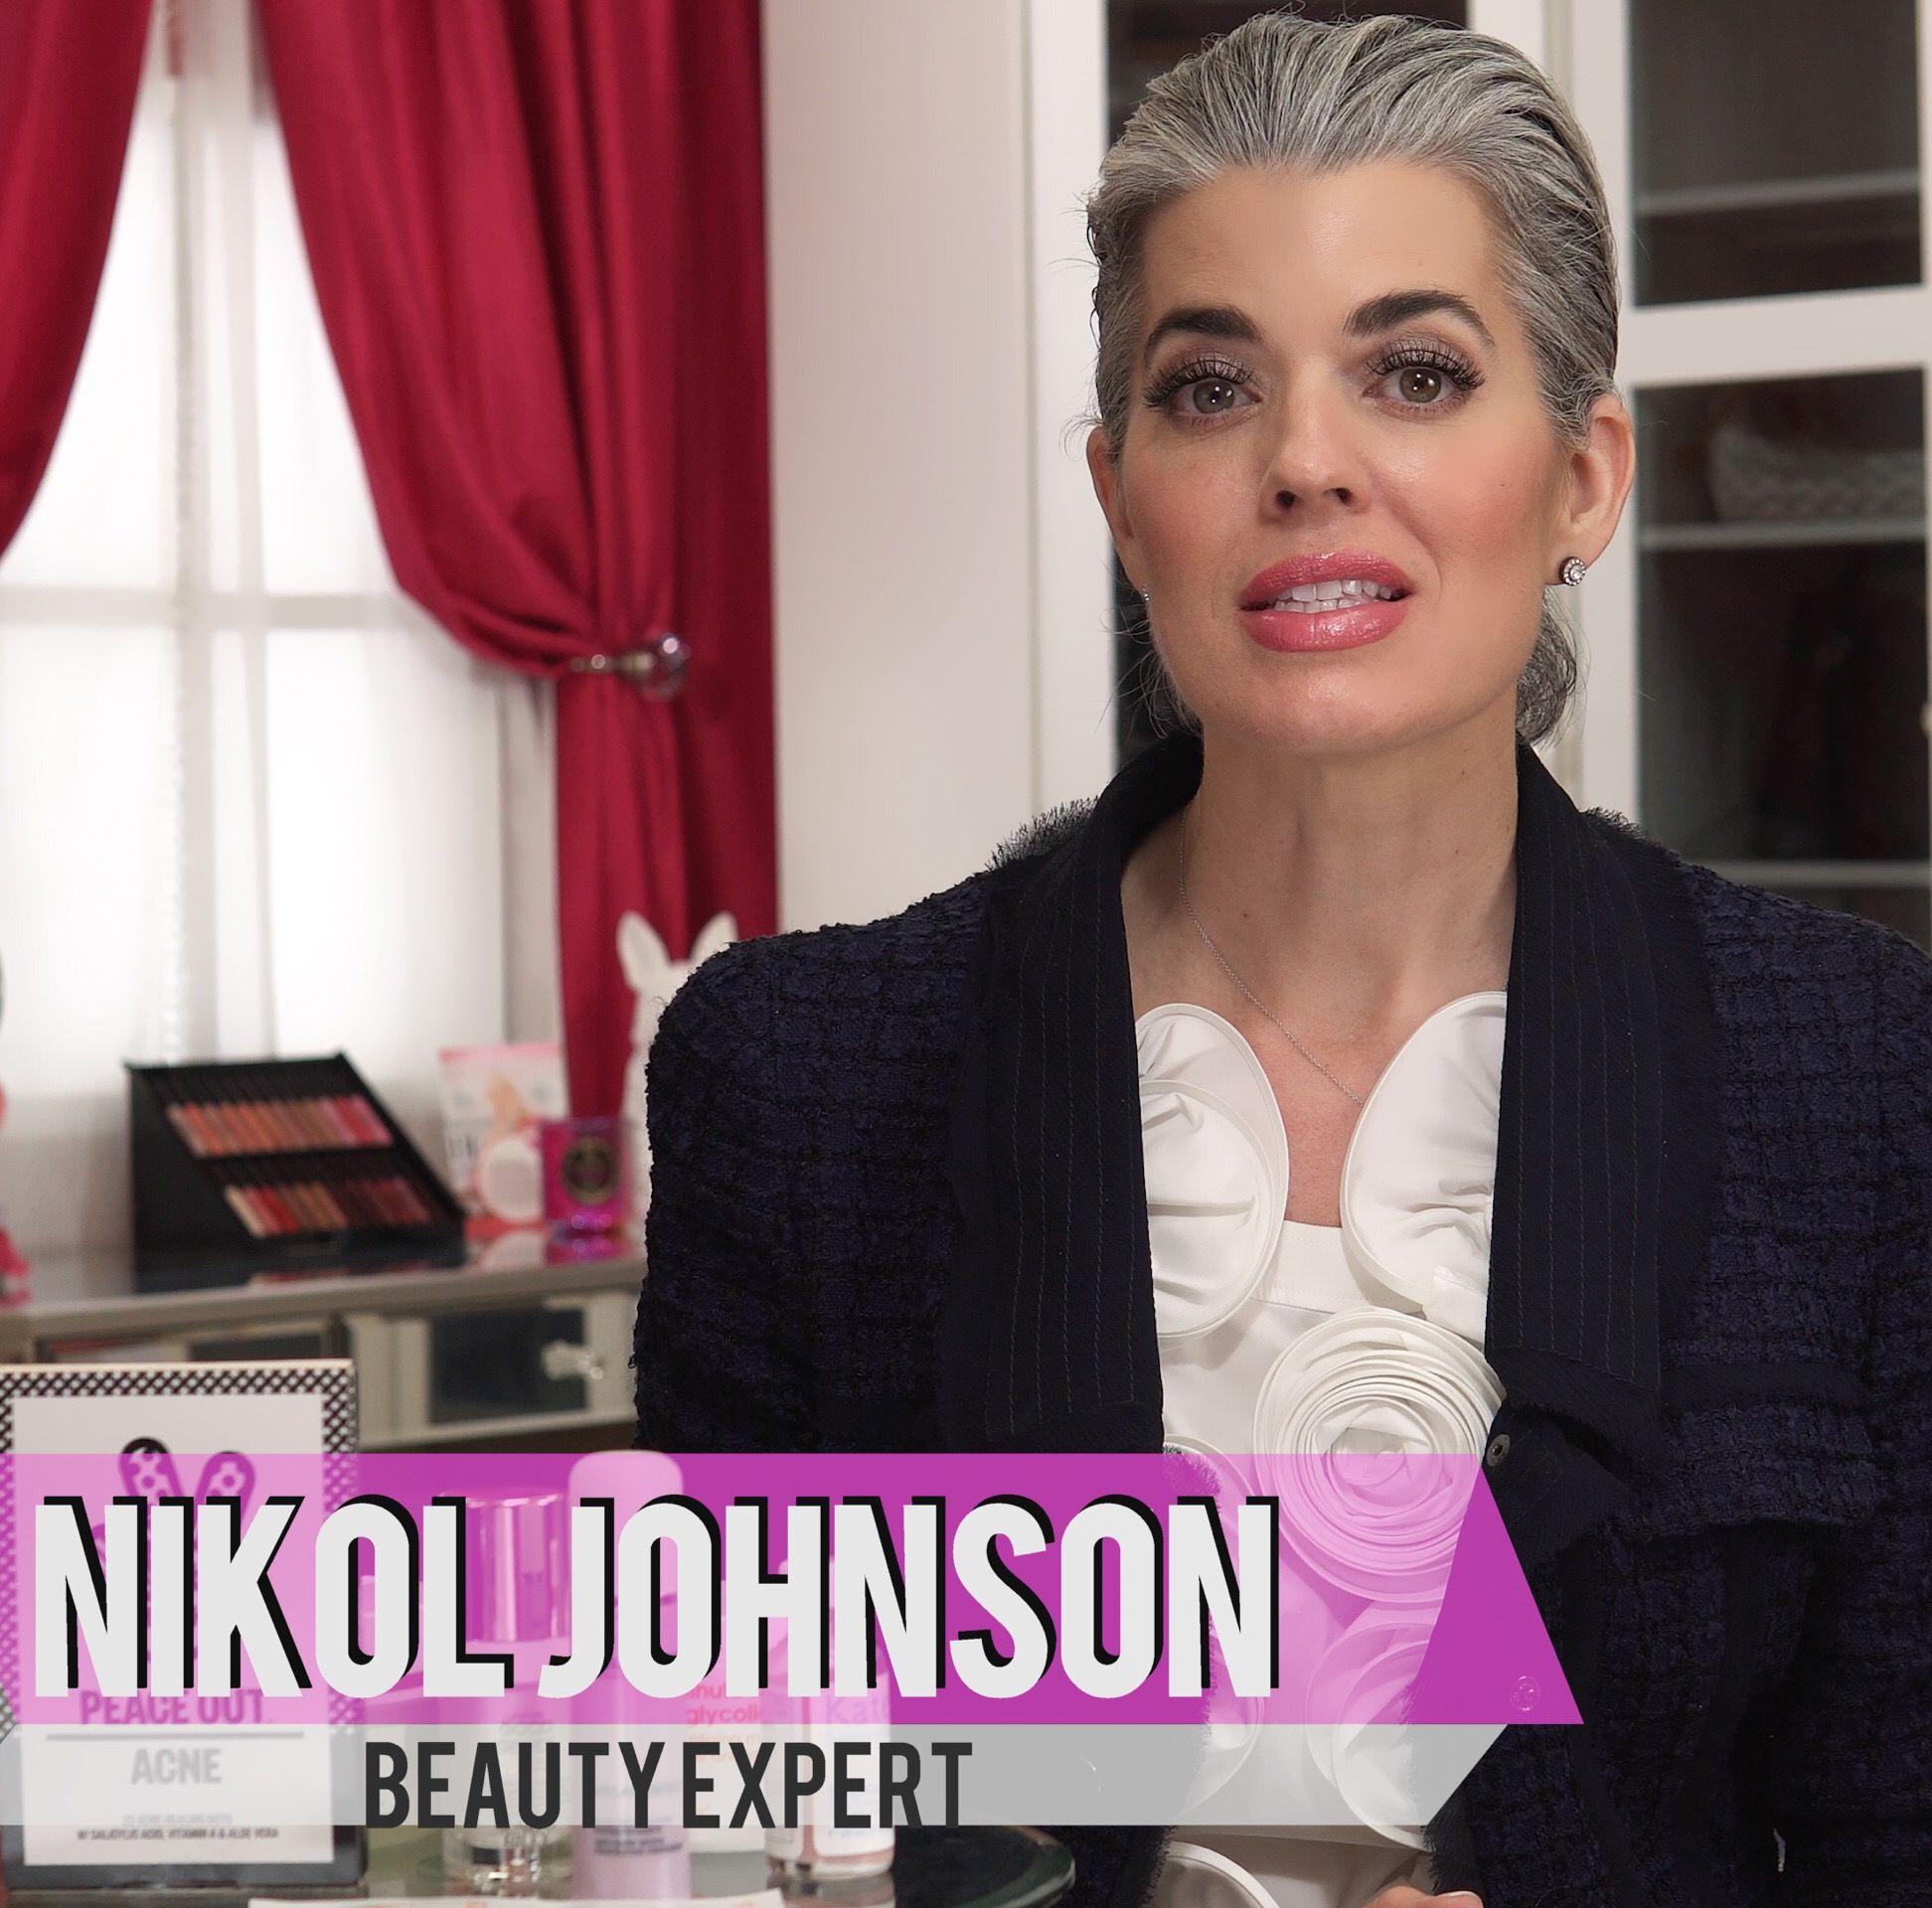 On YouTube sharing my Beauty Tips. Nikol Johnson (With